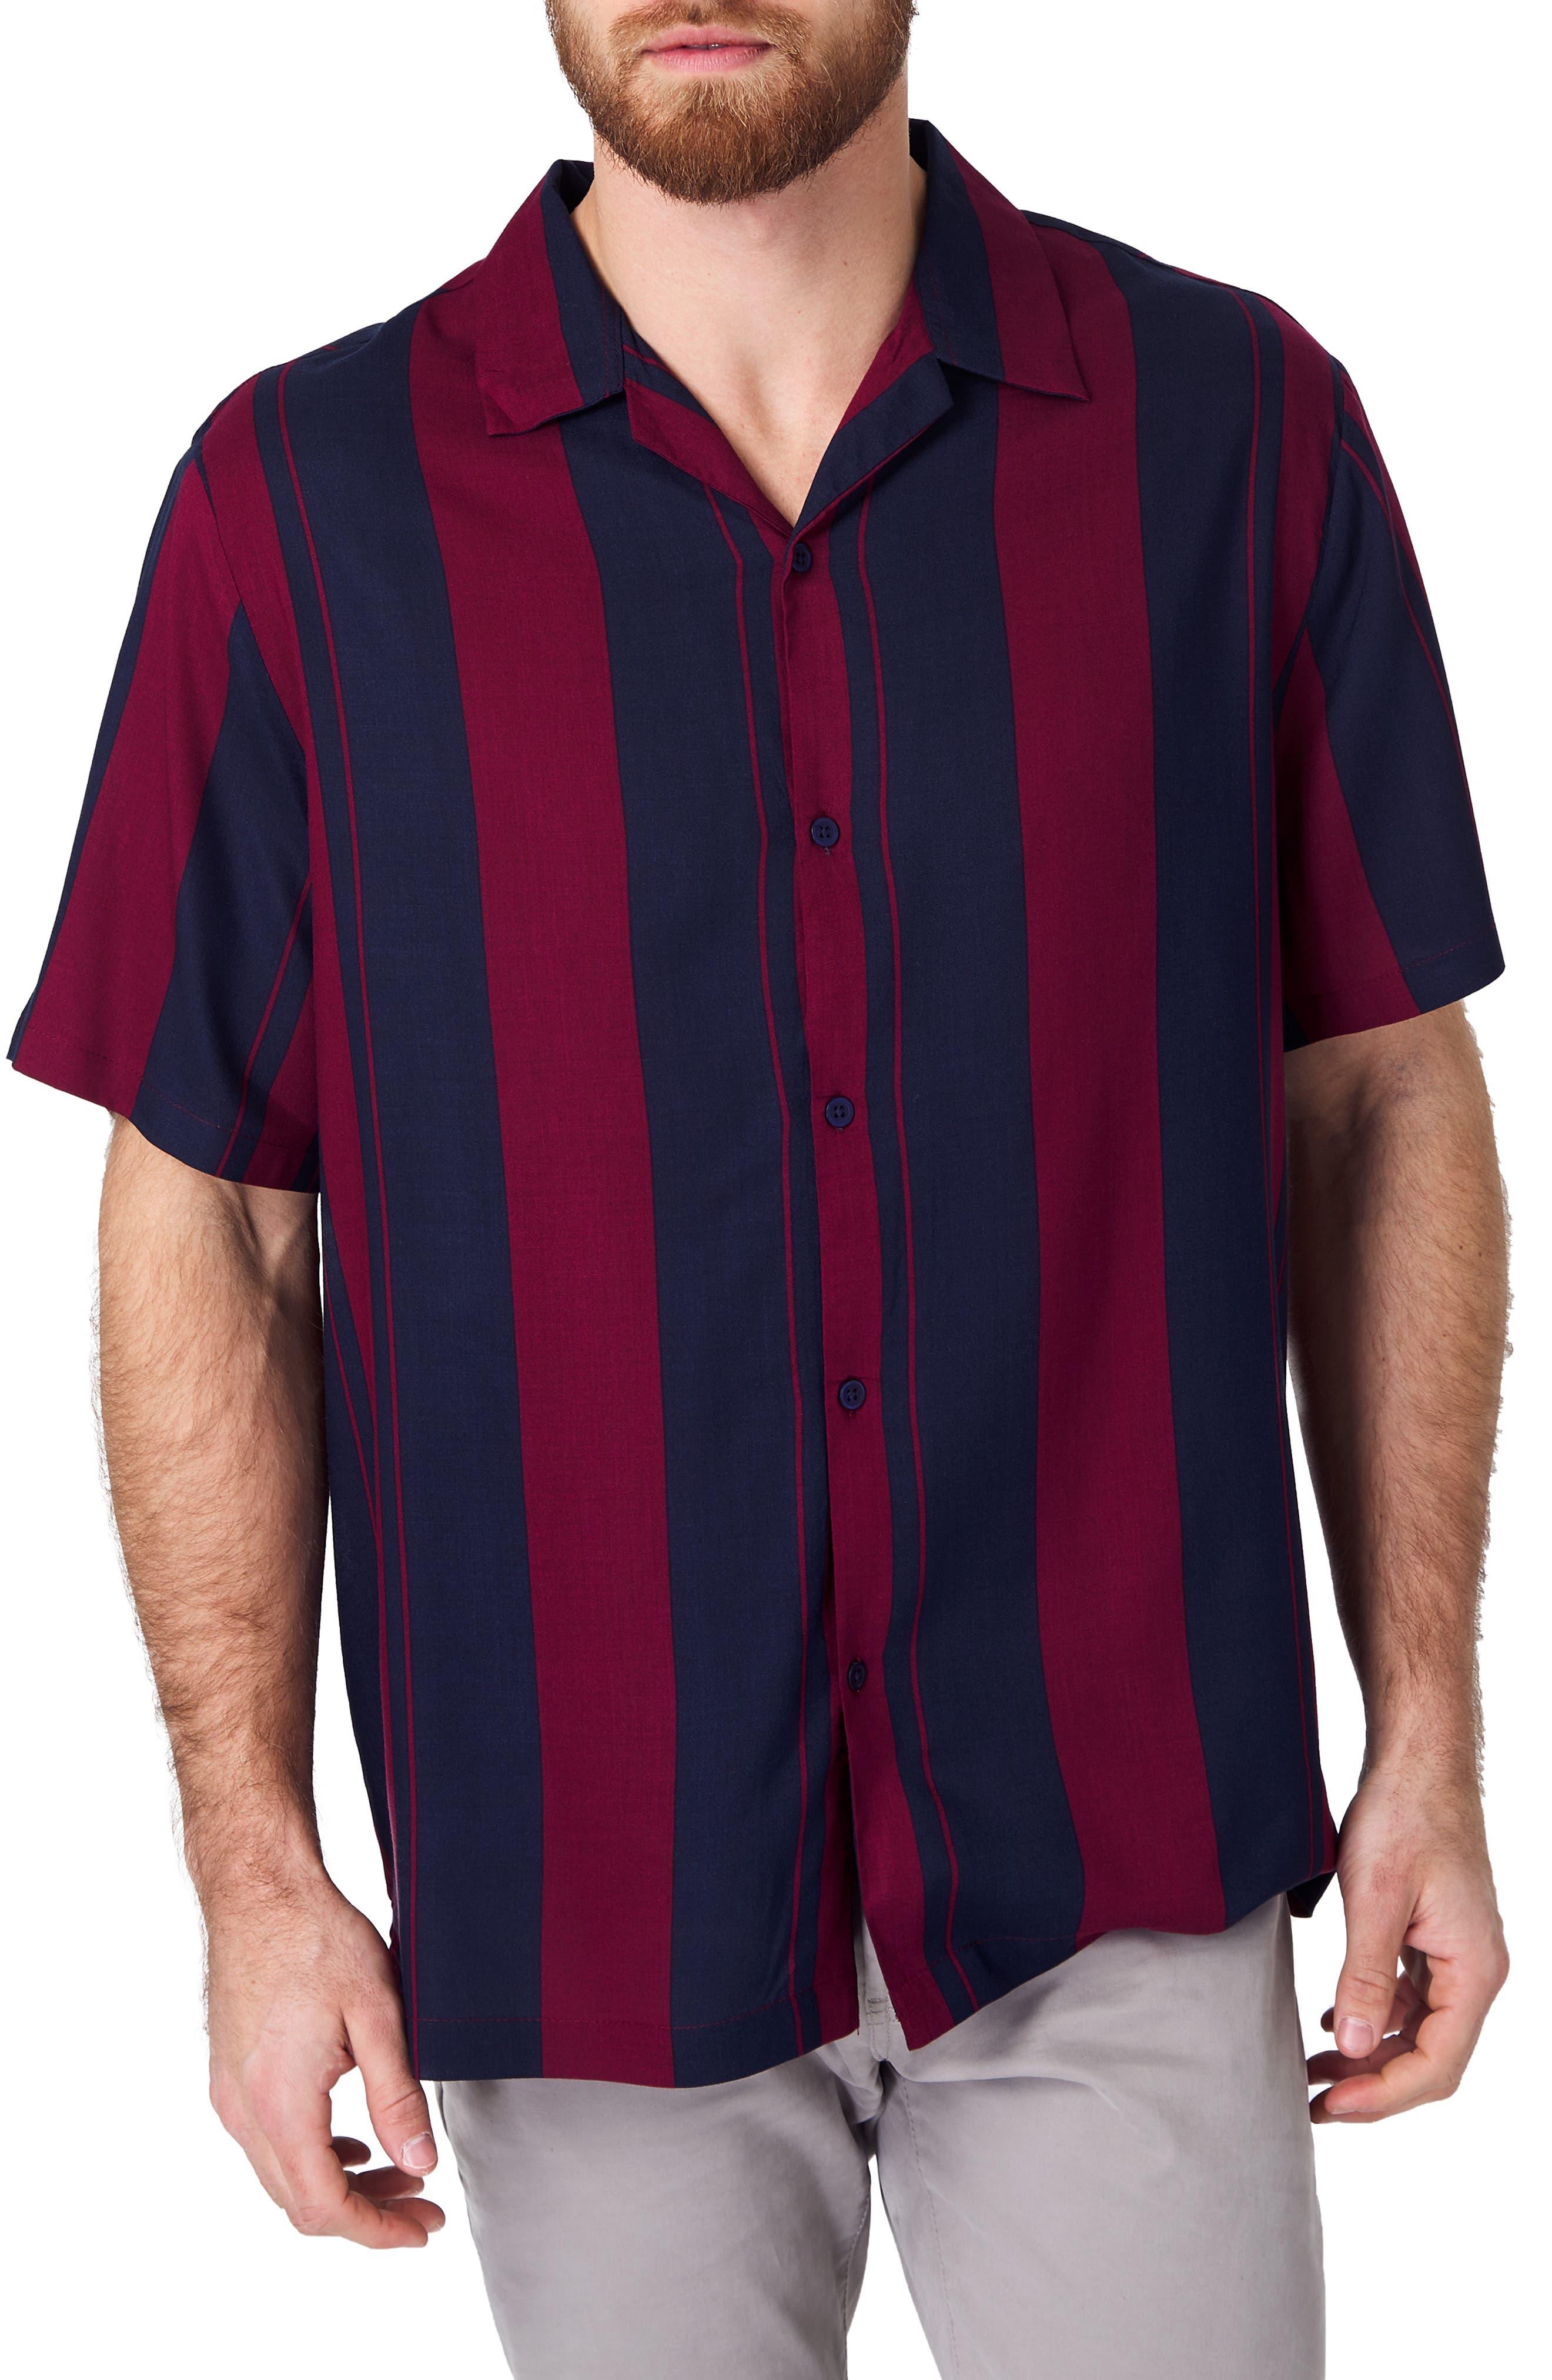 1950s Mens Shirts | Retro Bowling Shirts, Vintage Hawaiian Shirts Mens 7 Diamonds All Shook Up Slim Fit Stripe Camp Shirt $69.00 AT vintagedancer.com